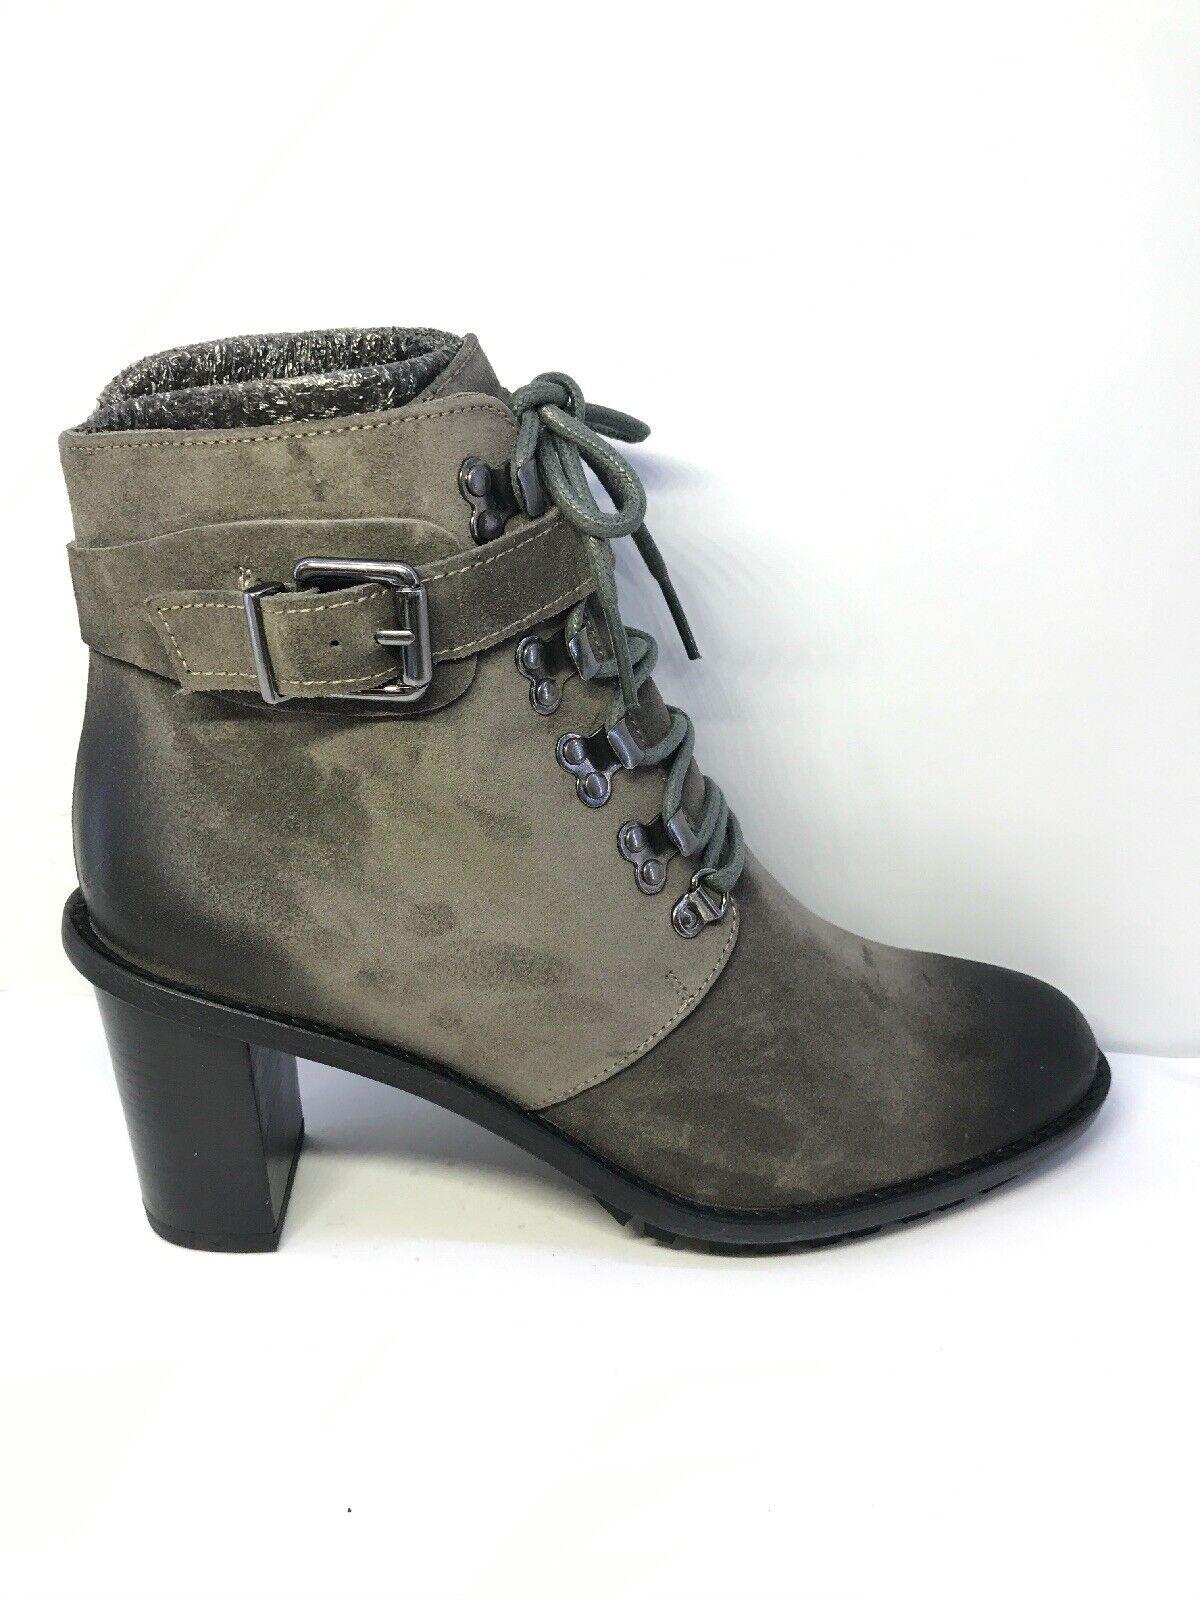 B 0197 Lloyd Germany Womens Grey Block Heeled Lace Up Boots Size EU 39.5